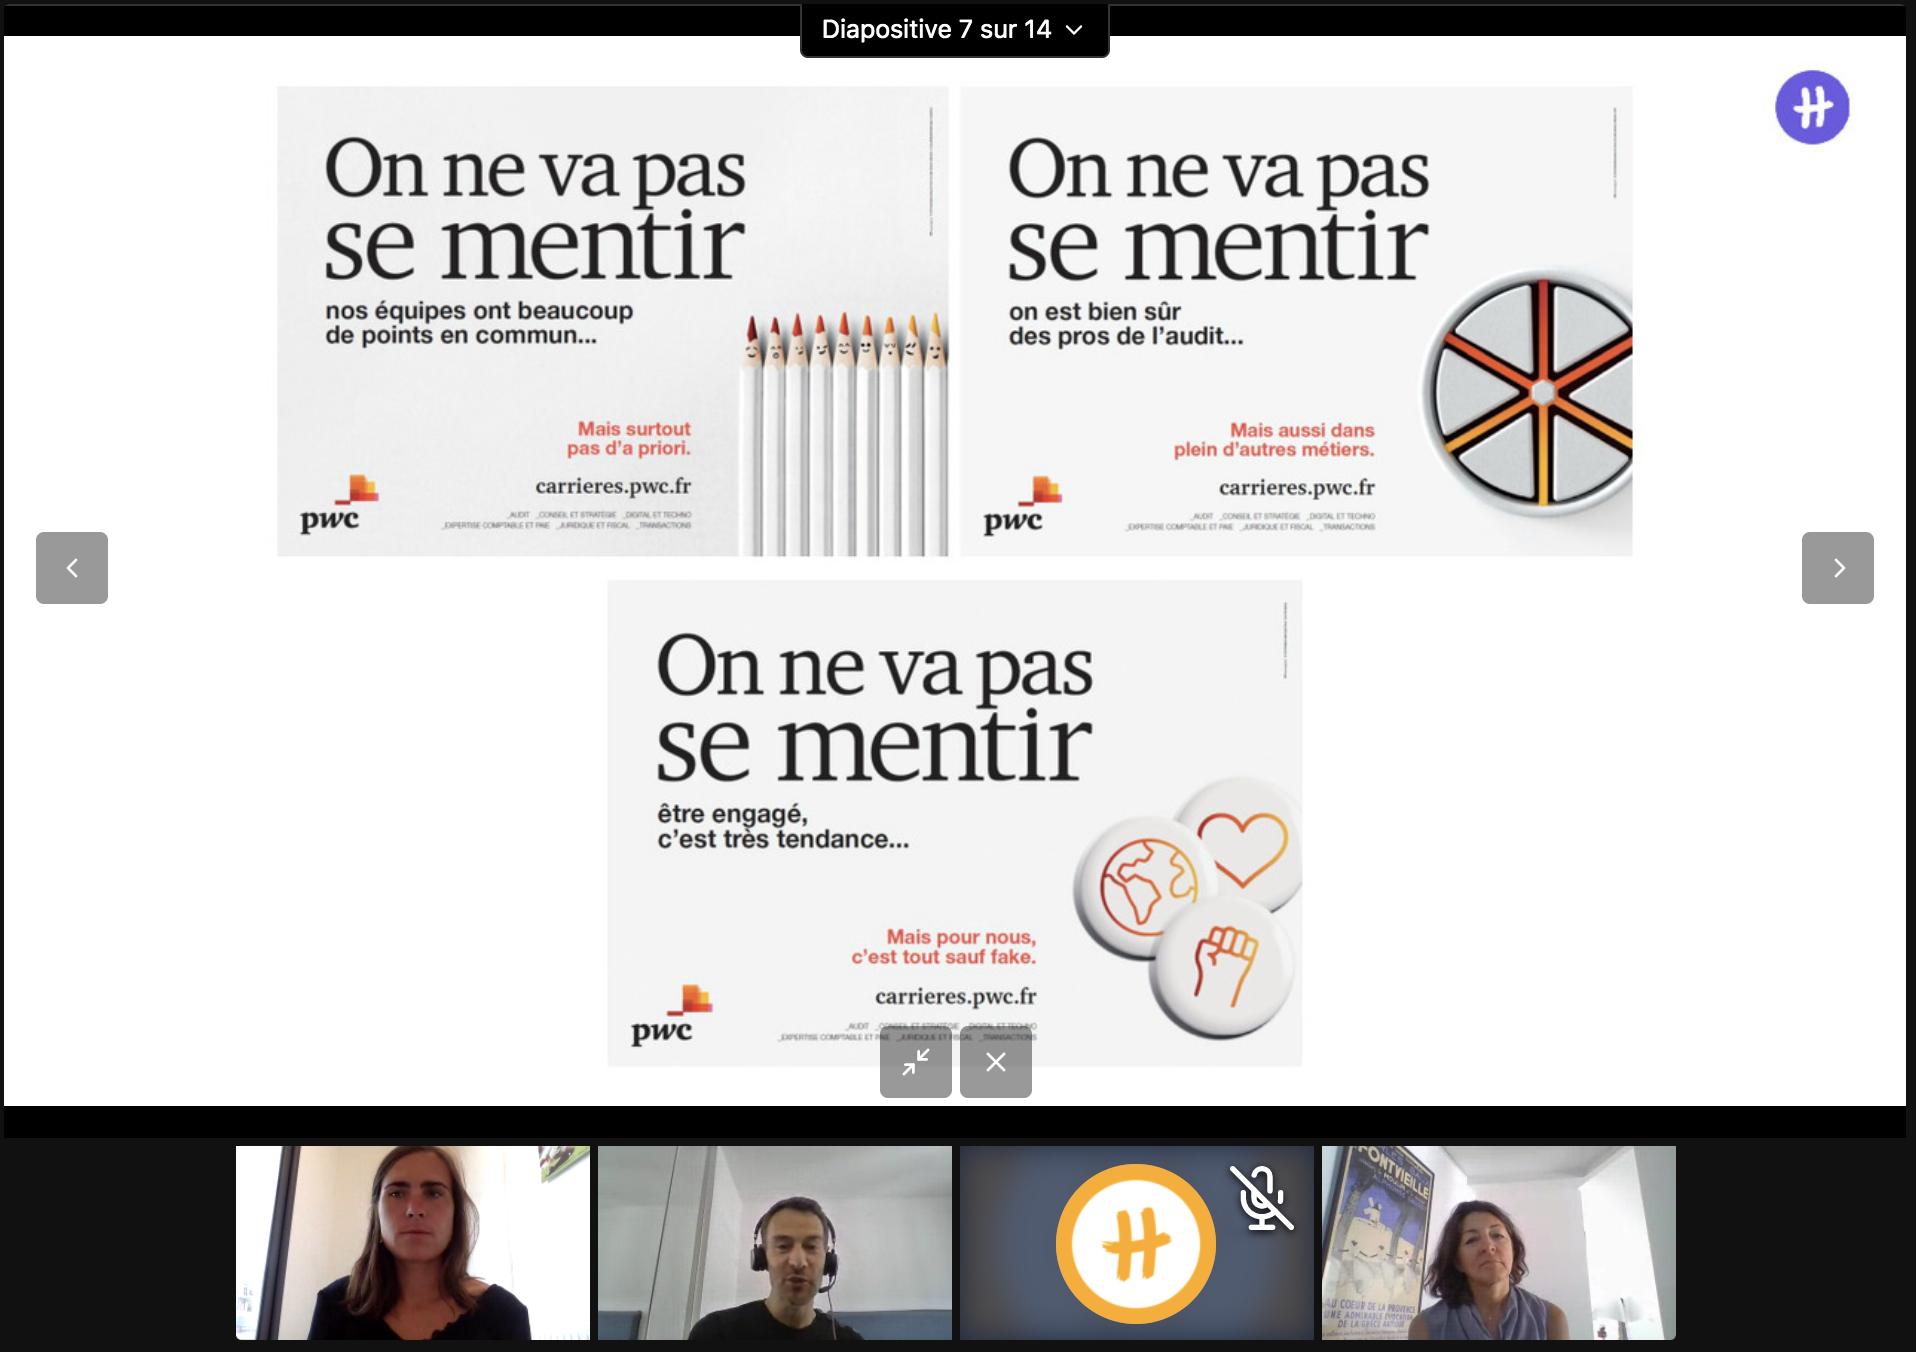 marque-employeur-webinar-experience-collaborateur